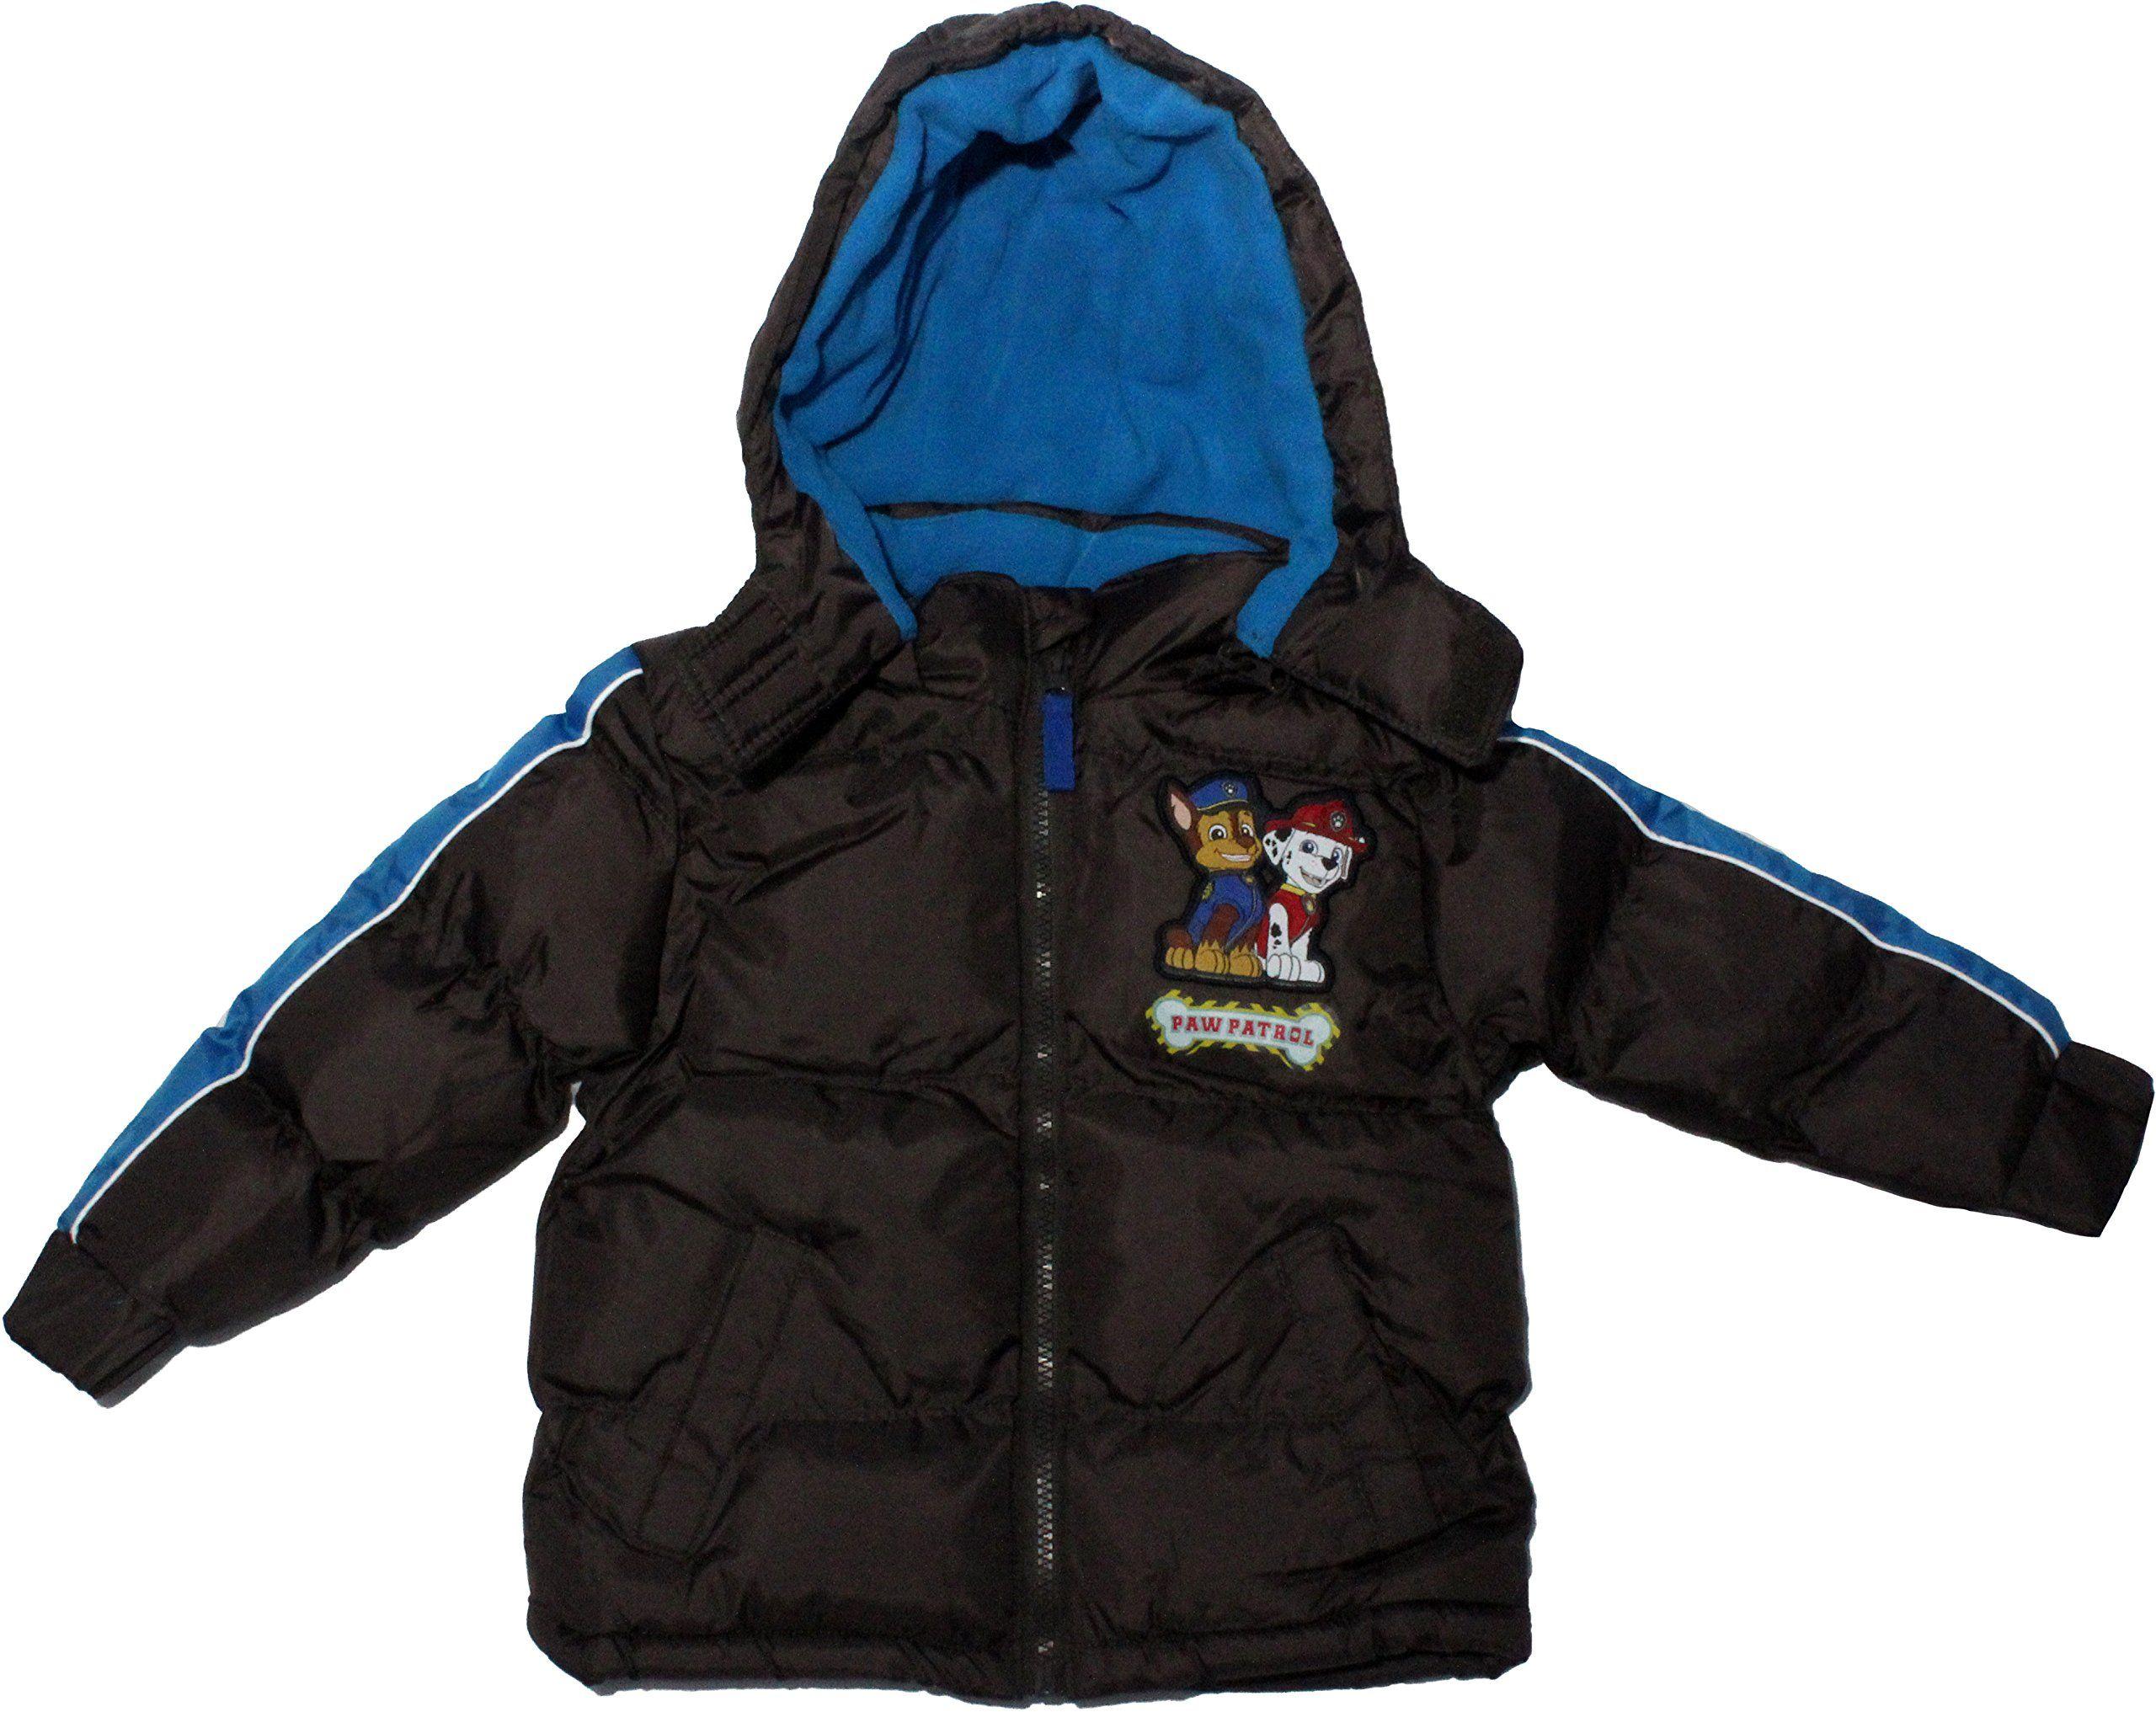 PAW Patrol Paw Patrol Toddler Boy Marshall Winter Jacket Coat